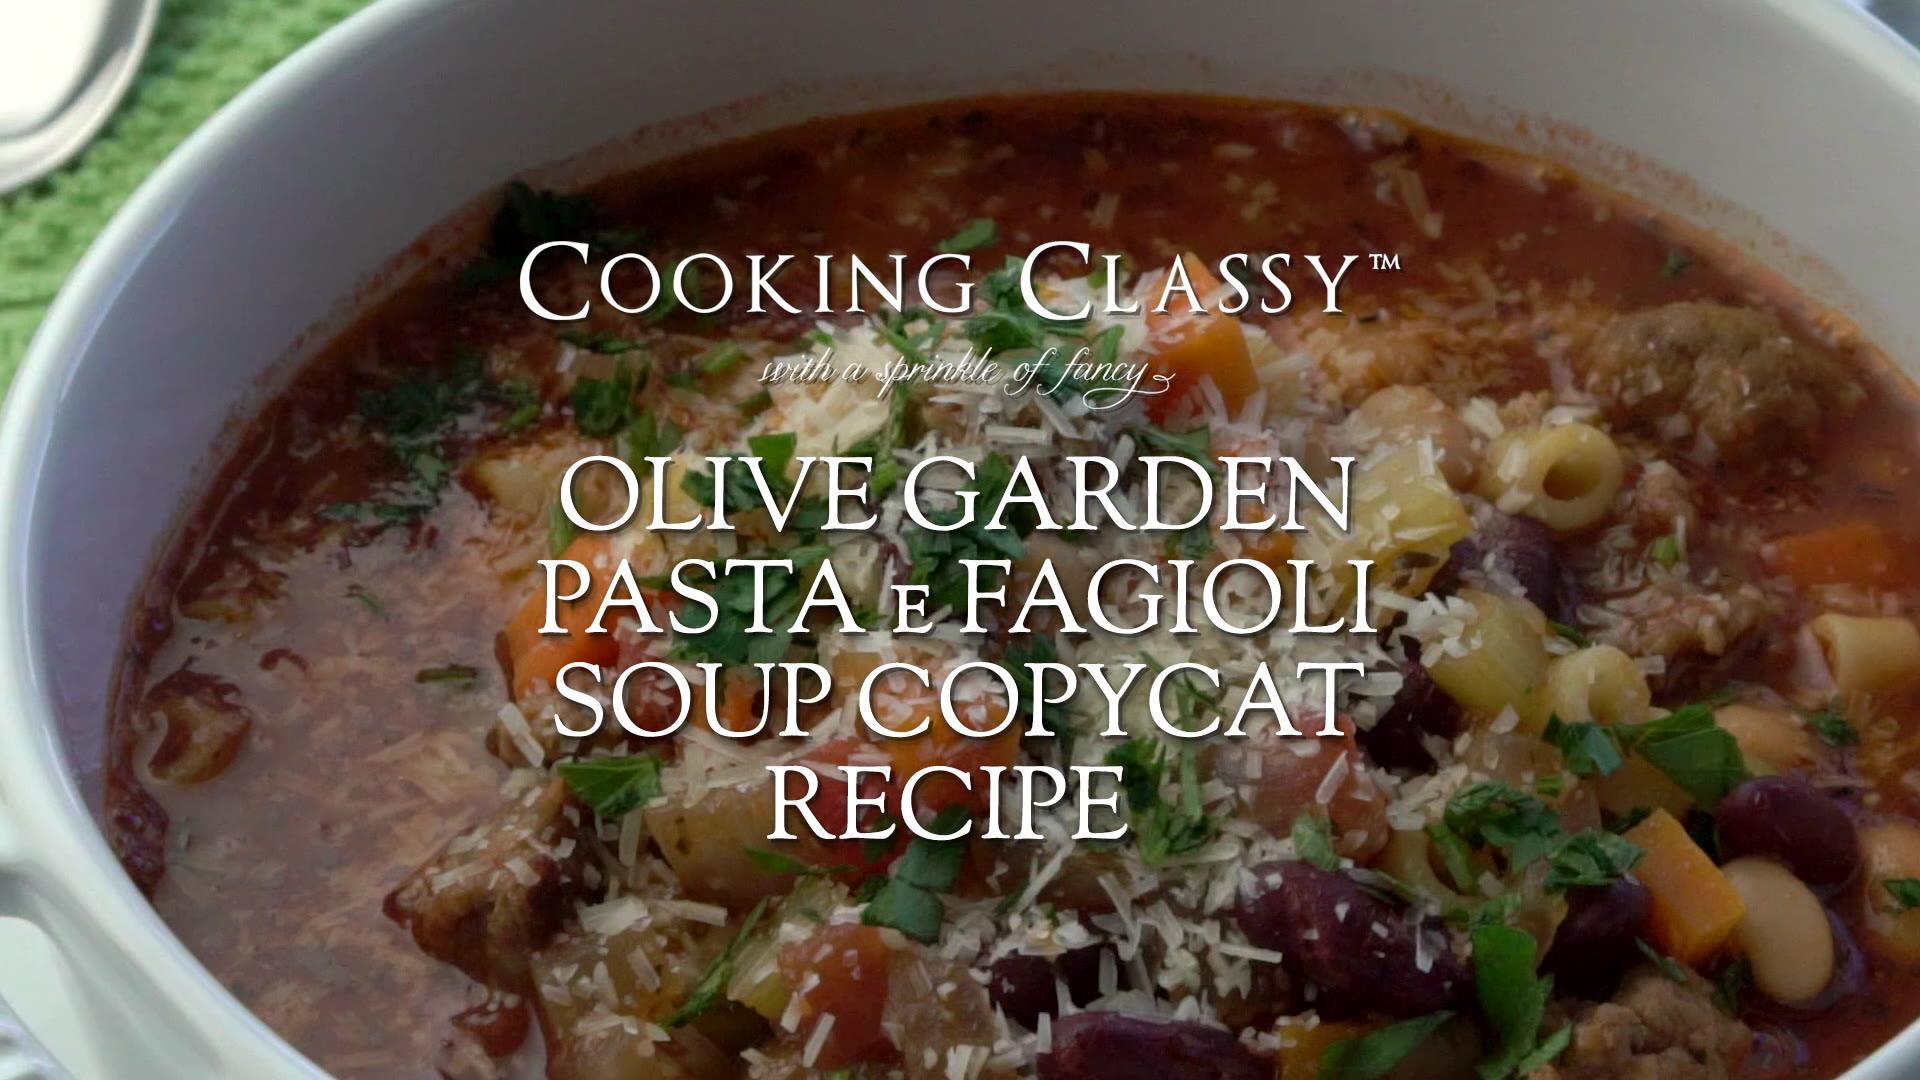 Olive garden recipes pasta e fagioli - Food pasta recipes